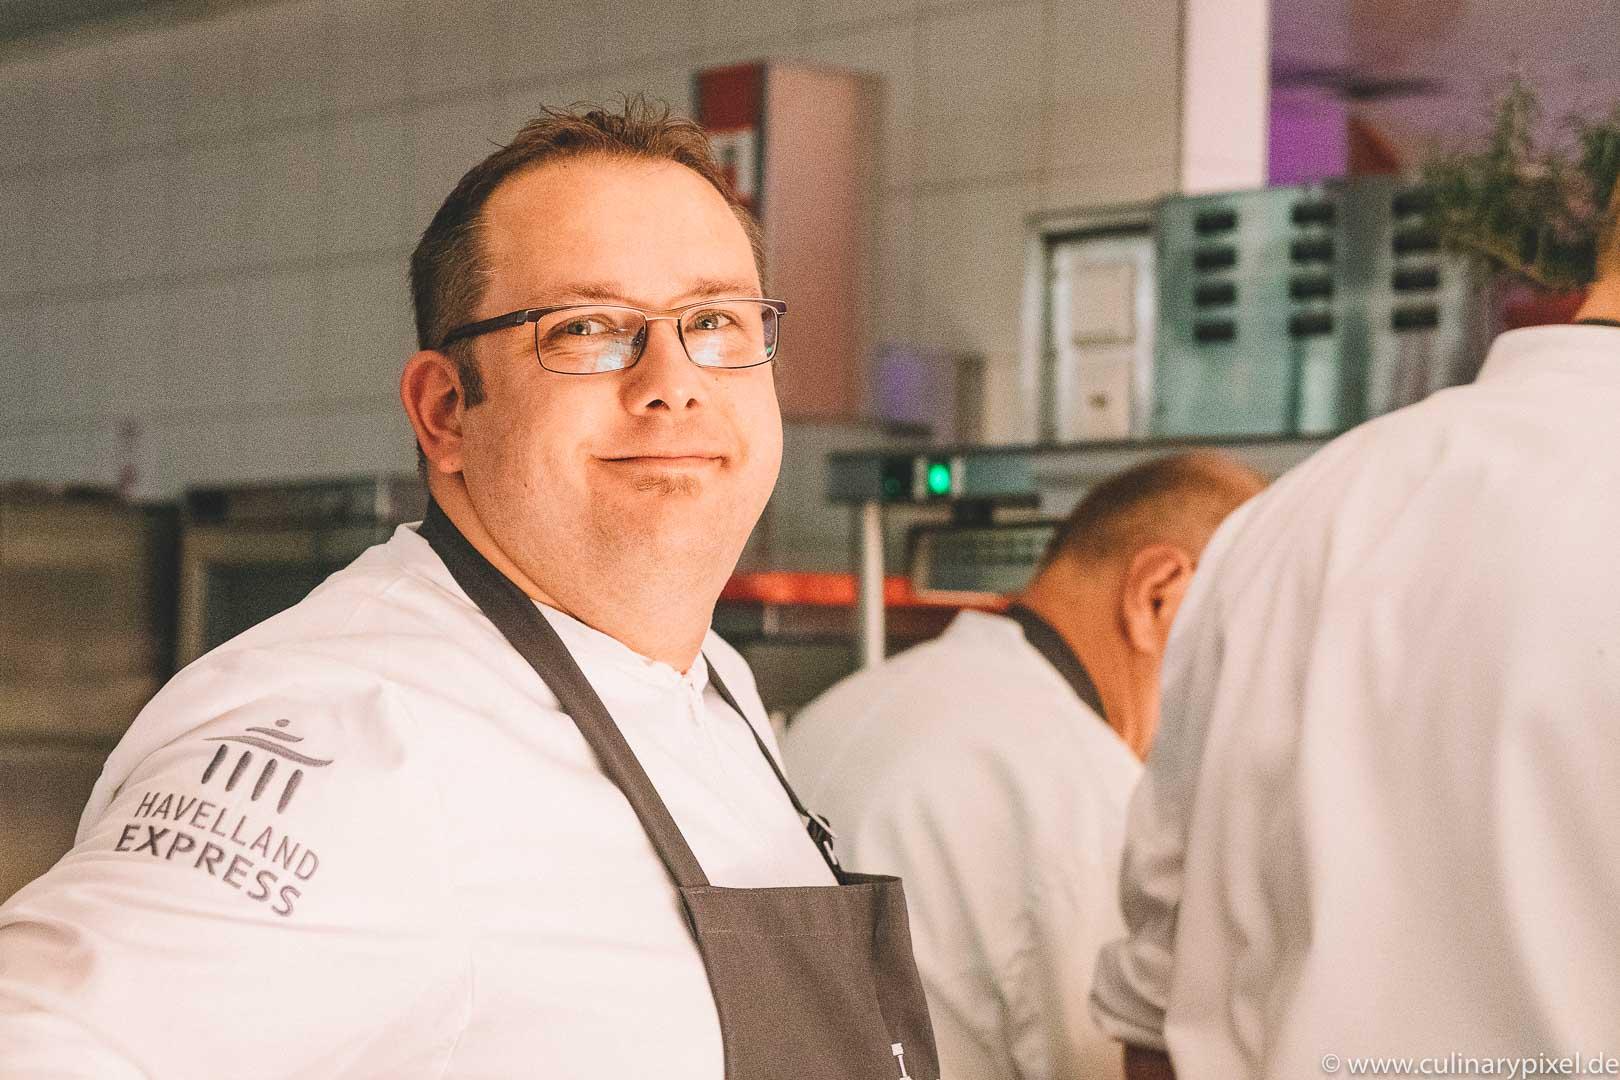 Küchenparty 2017 Schloss Fuschl: Ronny Siewert, Gourmet Restaurant Friedrich Franz, Heiligendamm